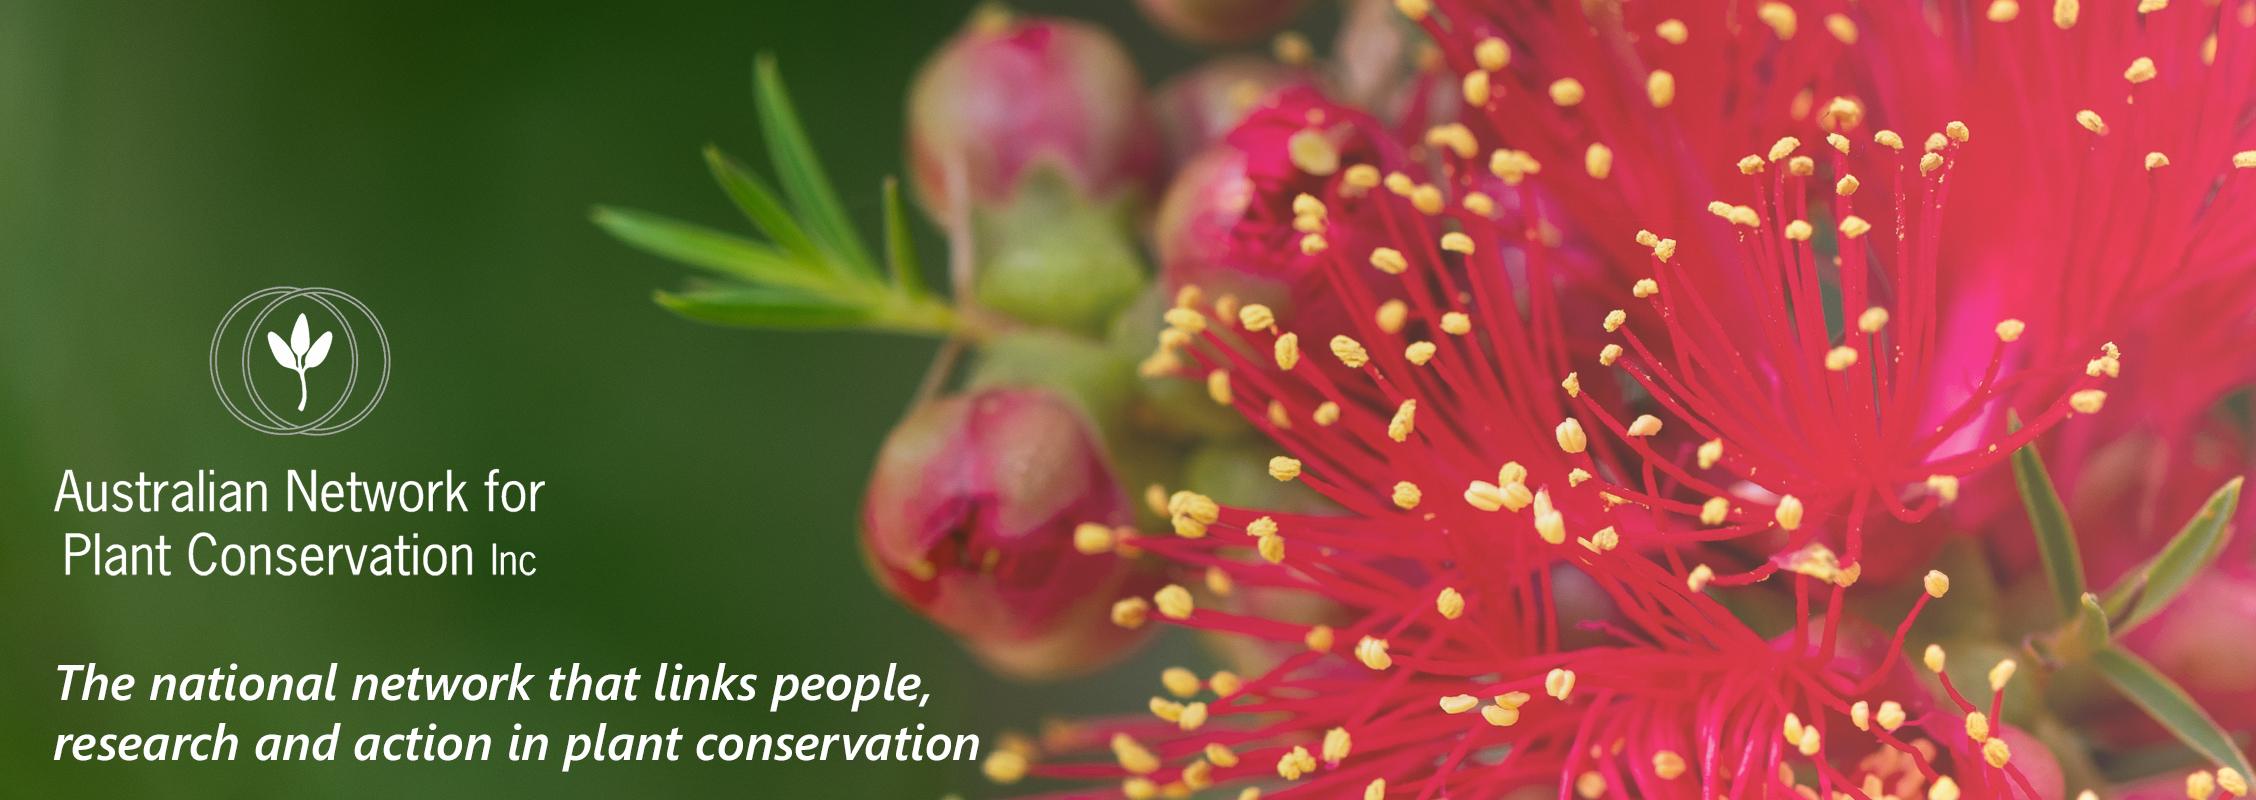 Australian Network for Plant Conservation (ANPC) Inc. logo